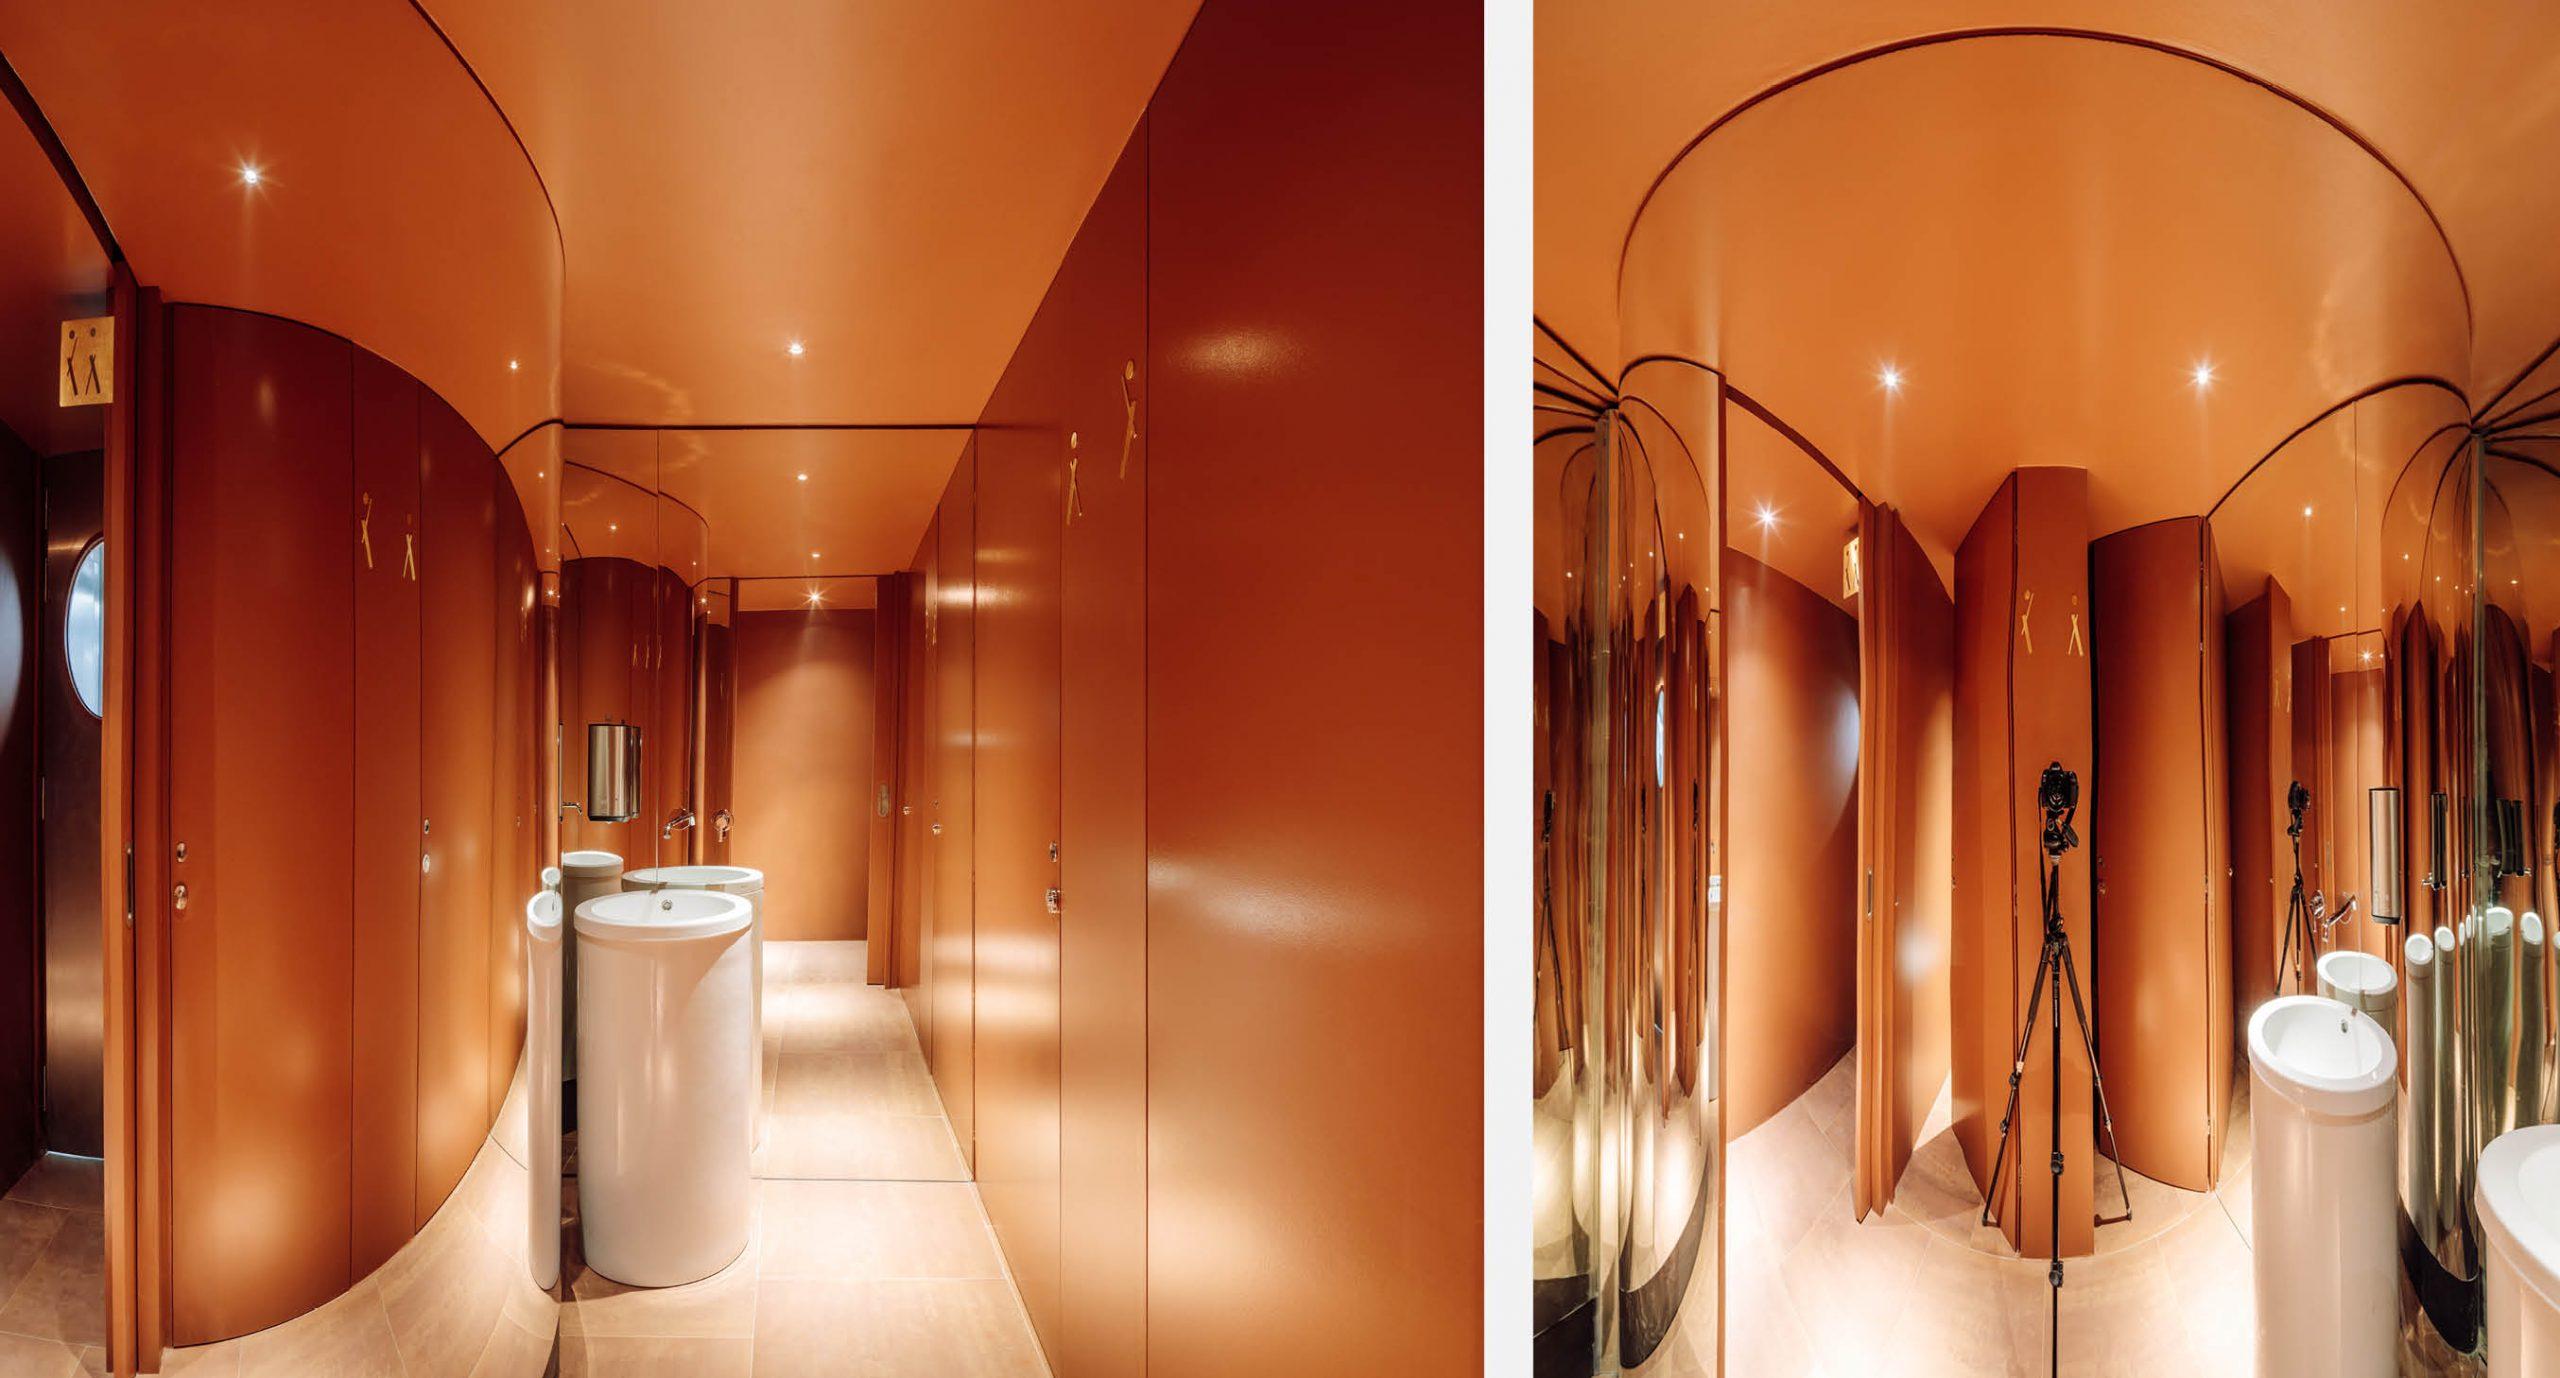 Spacegram_Nomada_Restaurant_Red_WoodPanels_CNC_Gold_Mirror_wc_01